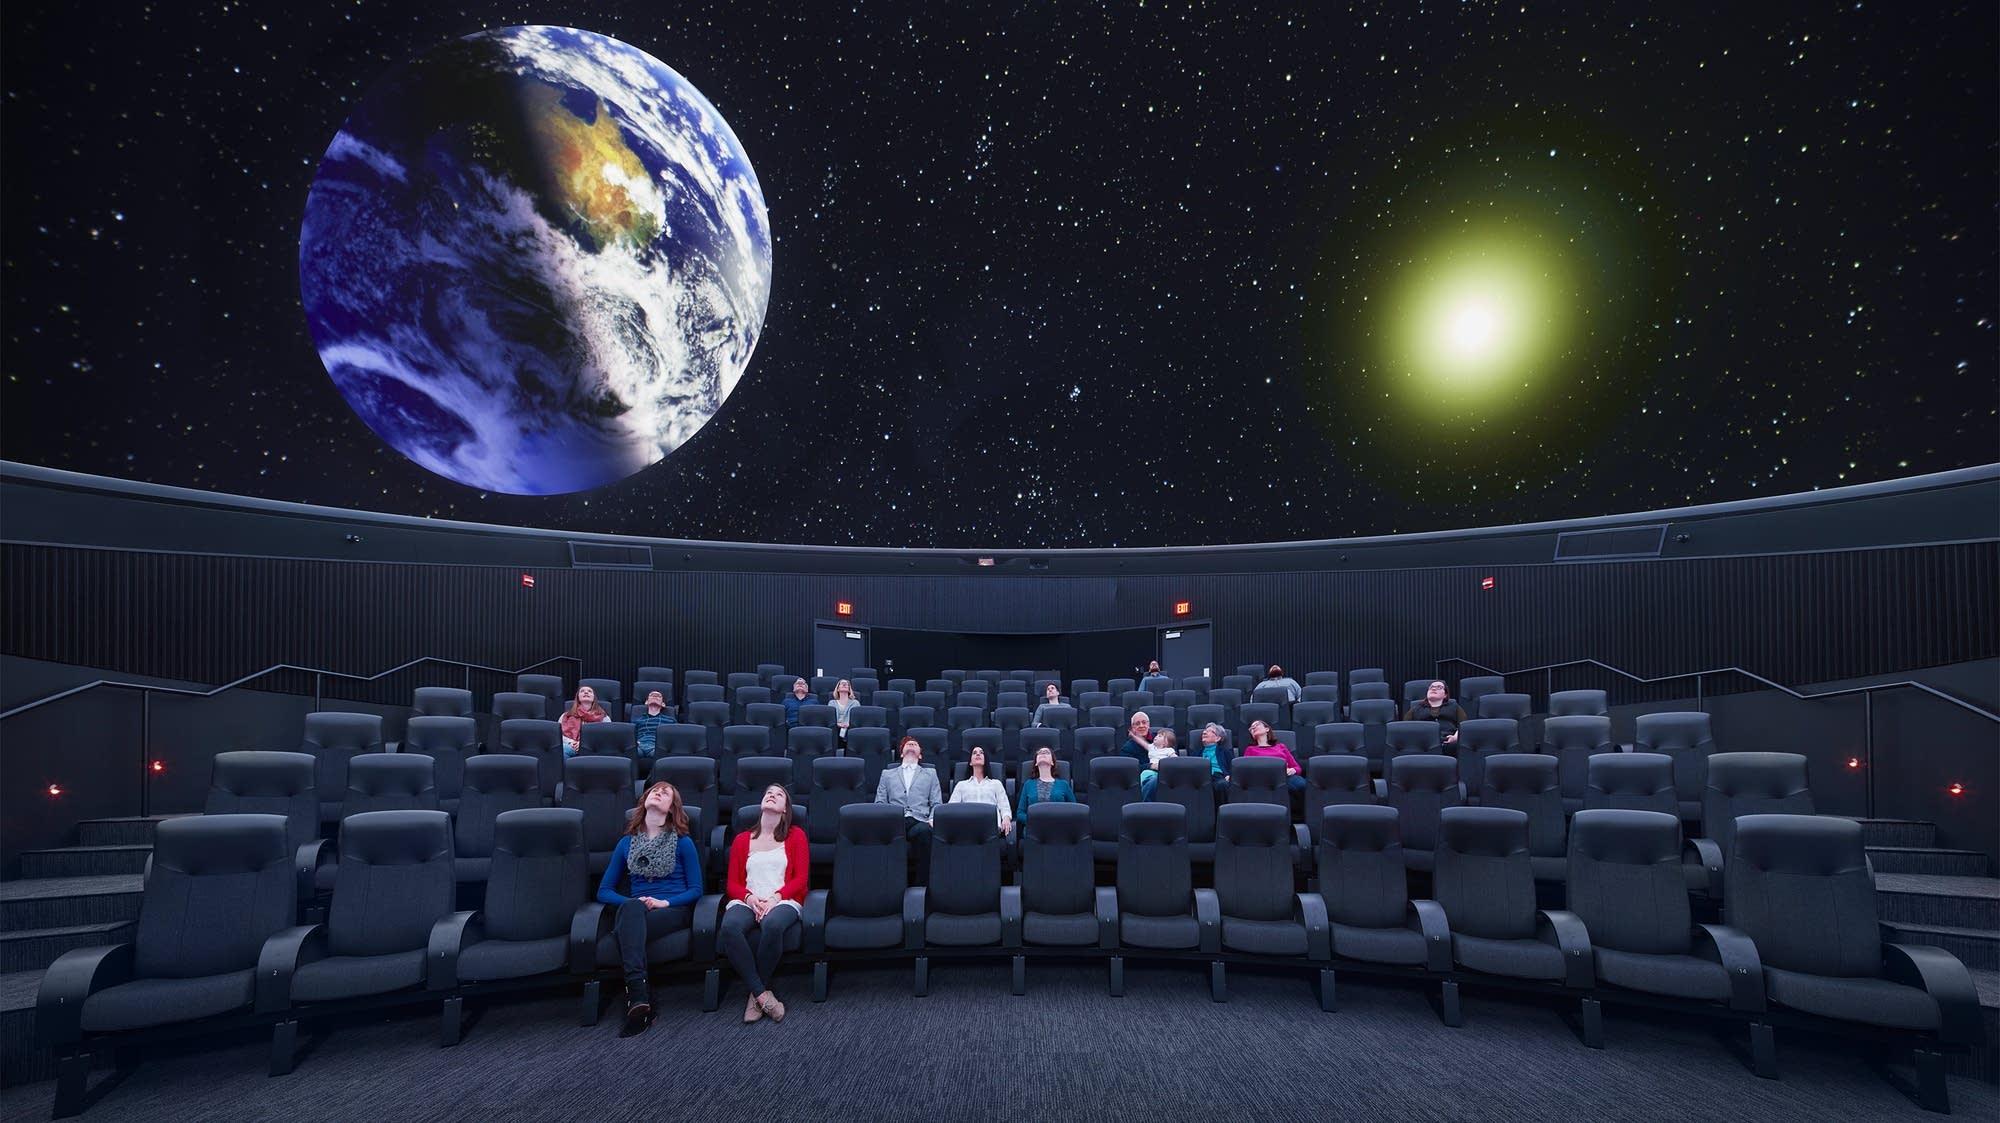 The planetarium at the University of Minnesota's Bell Museum